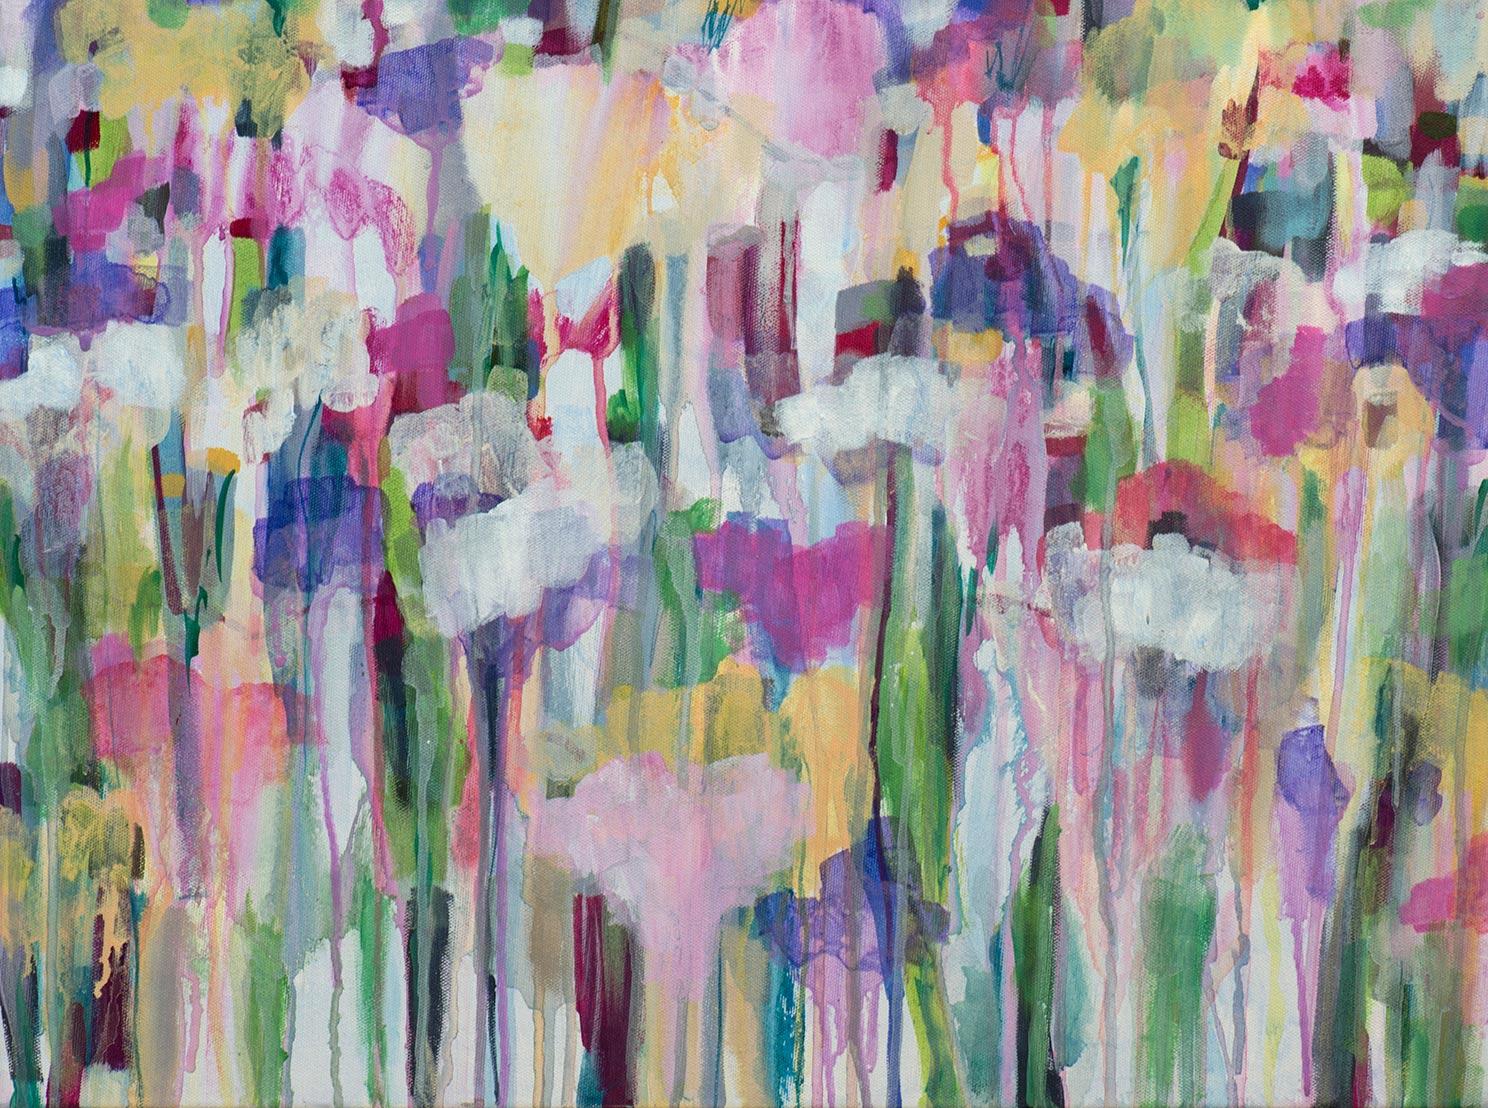 Abstract-Painting-Giselle-Ayupova-120819-acrylic-painting.jpg